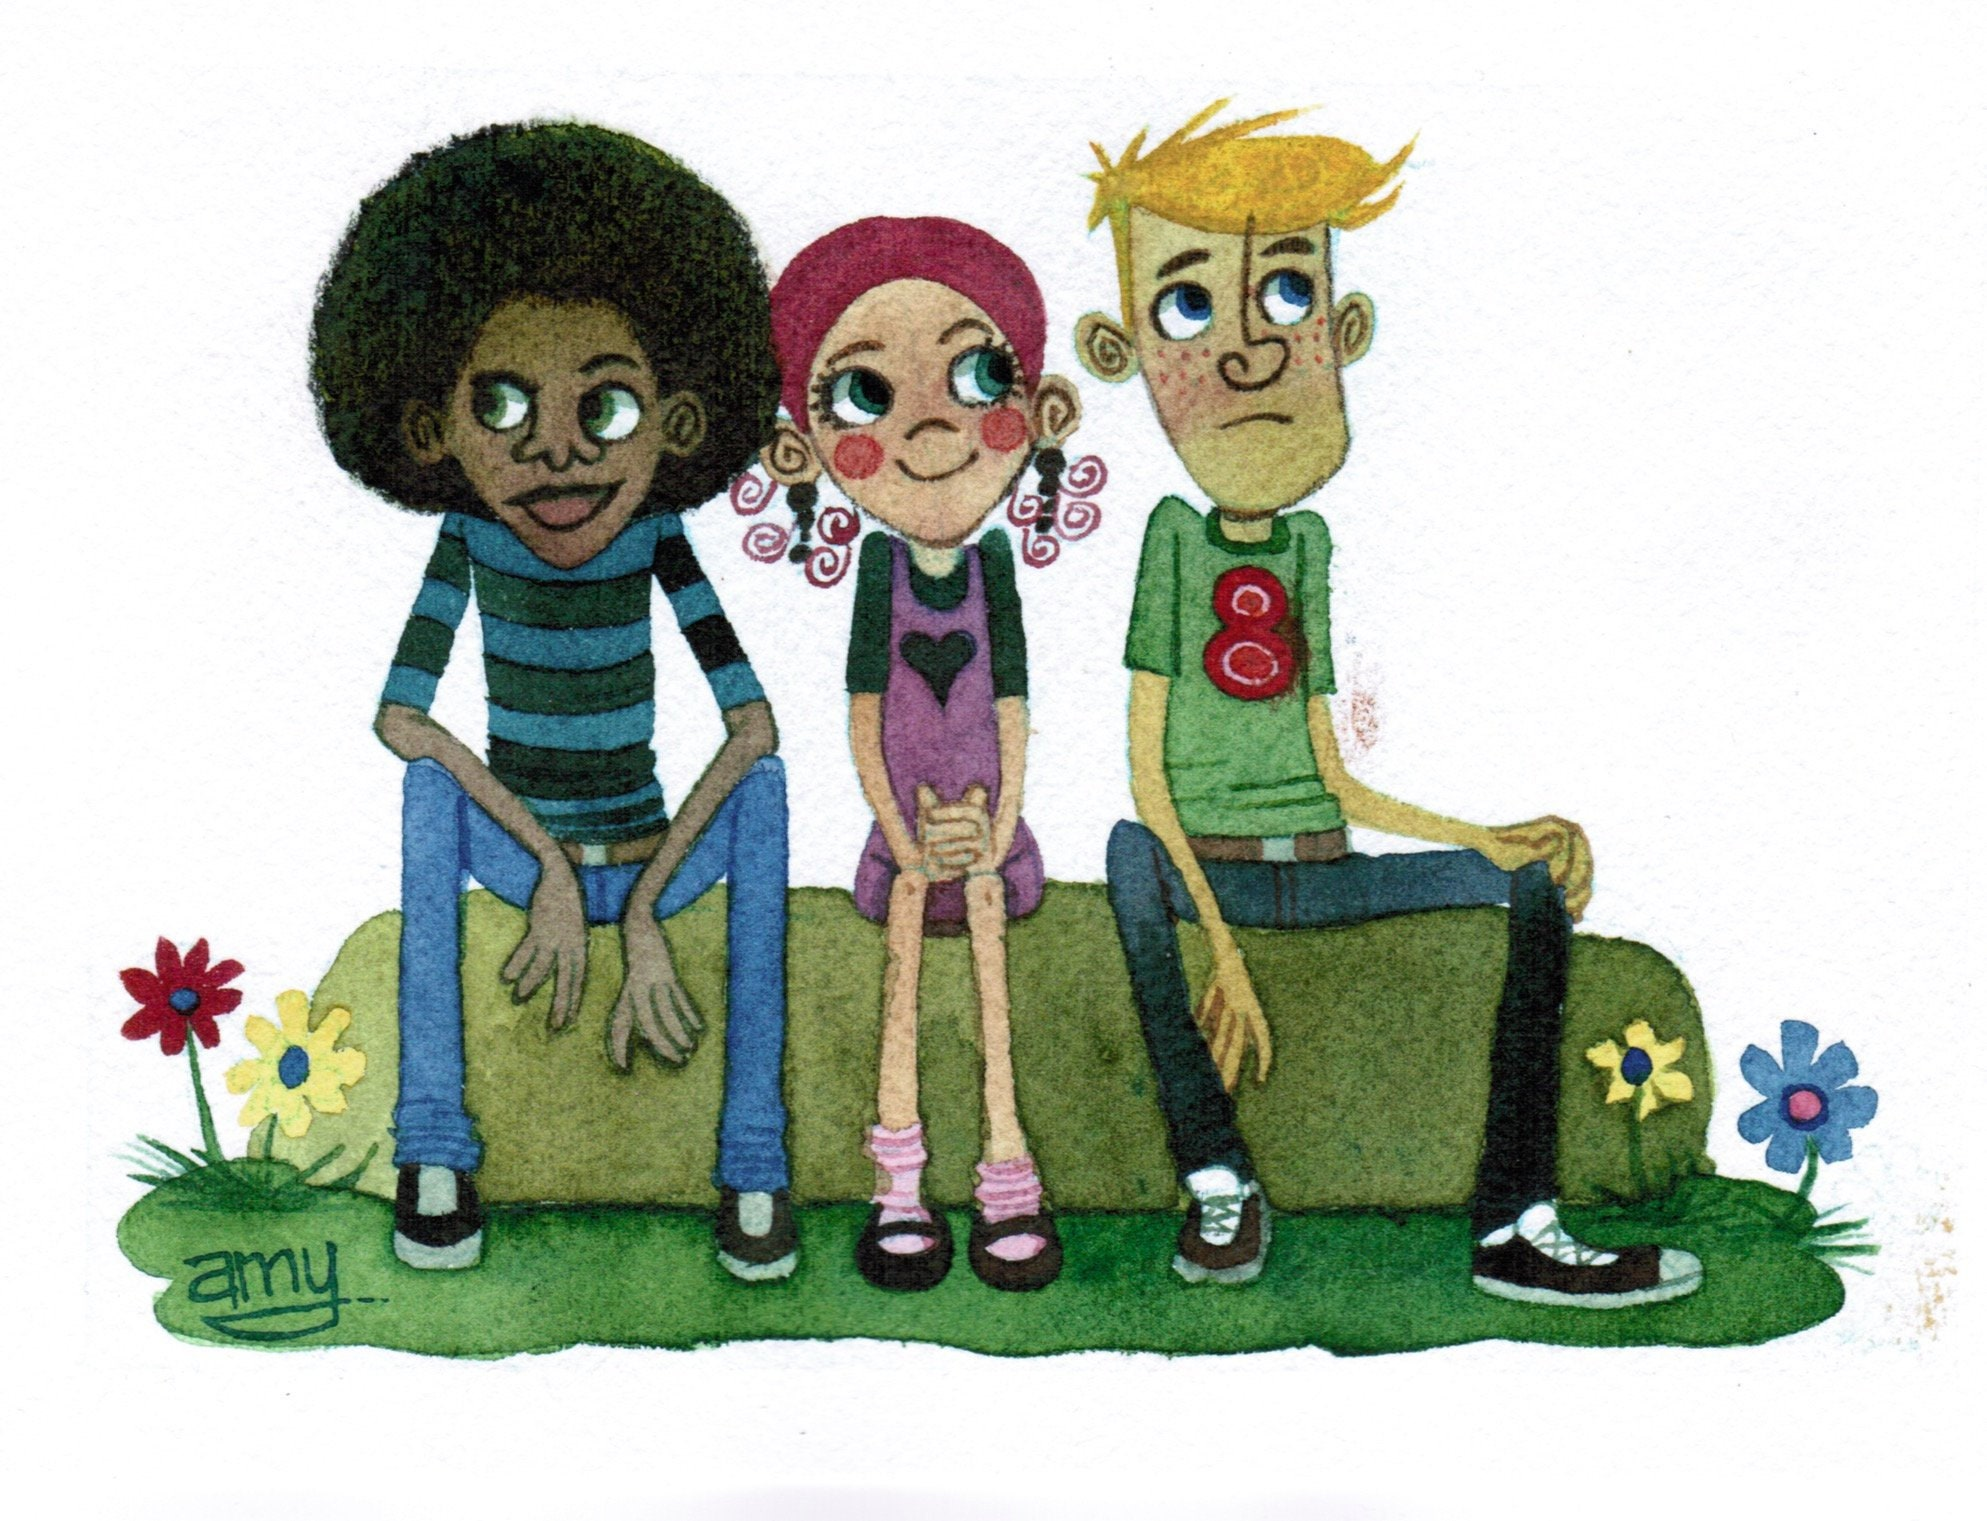 Original Cartoon Illustration Of Three Shy Teenage Friends Etsy